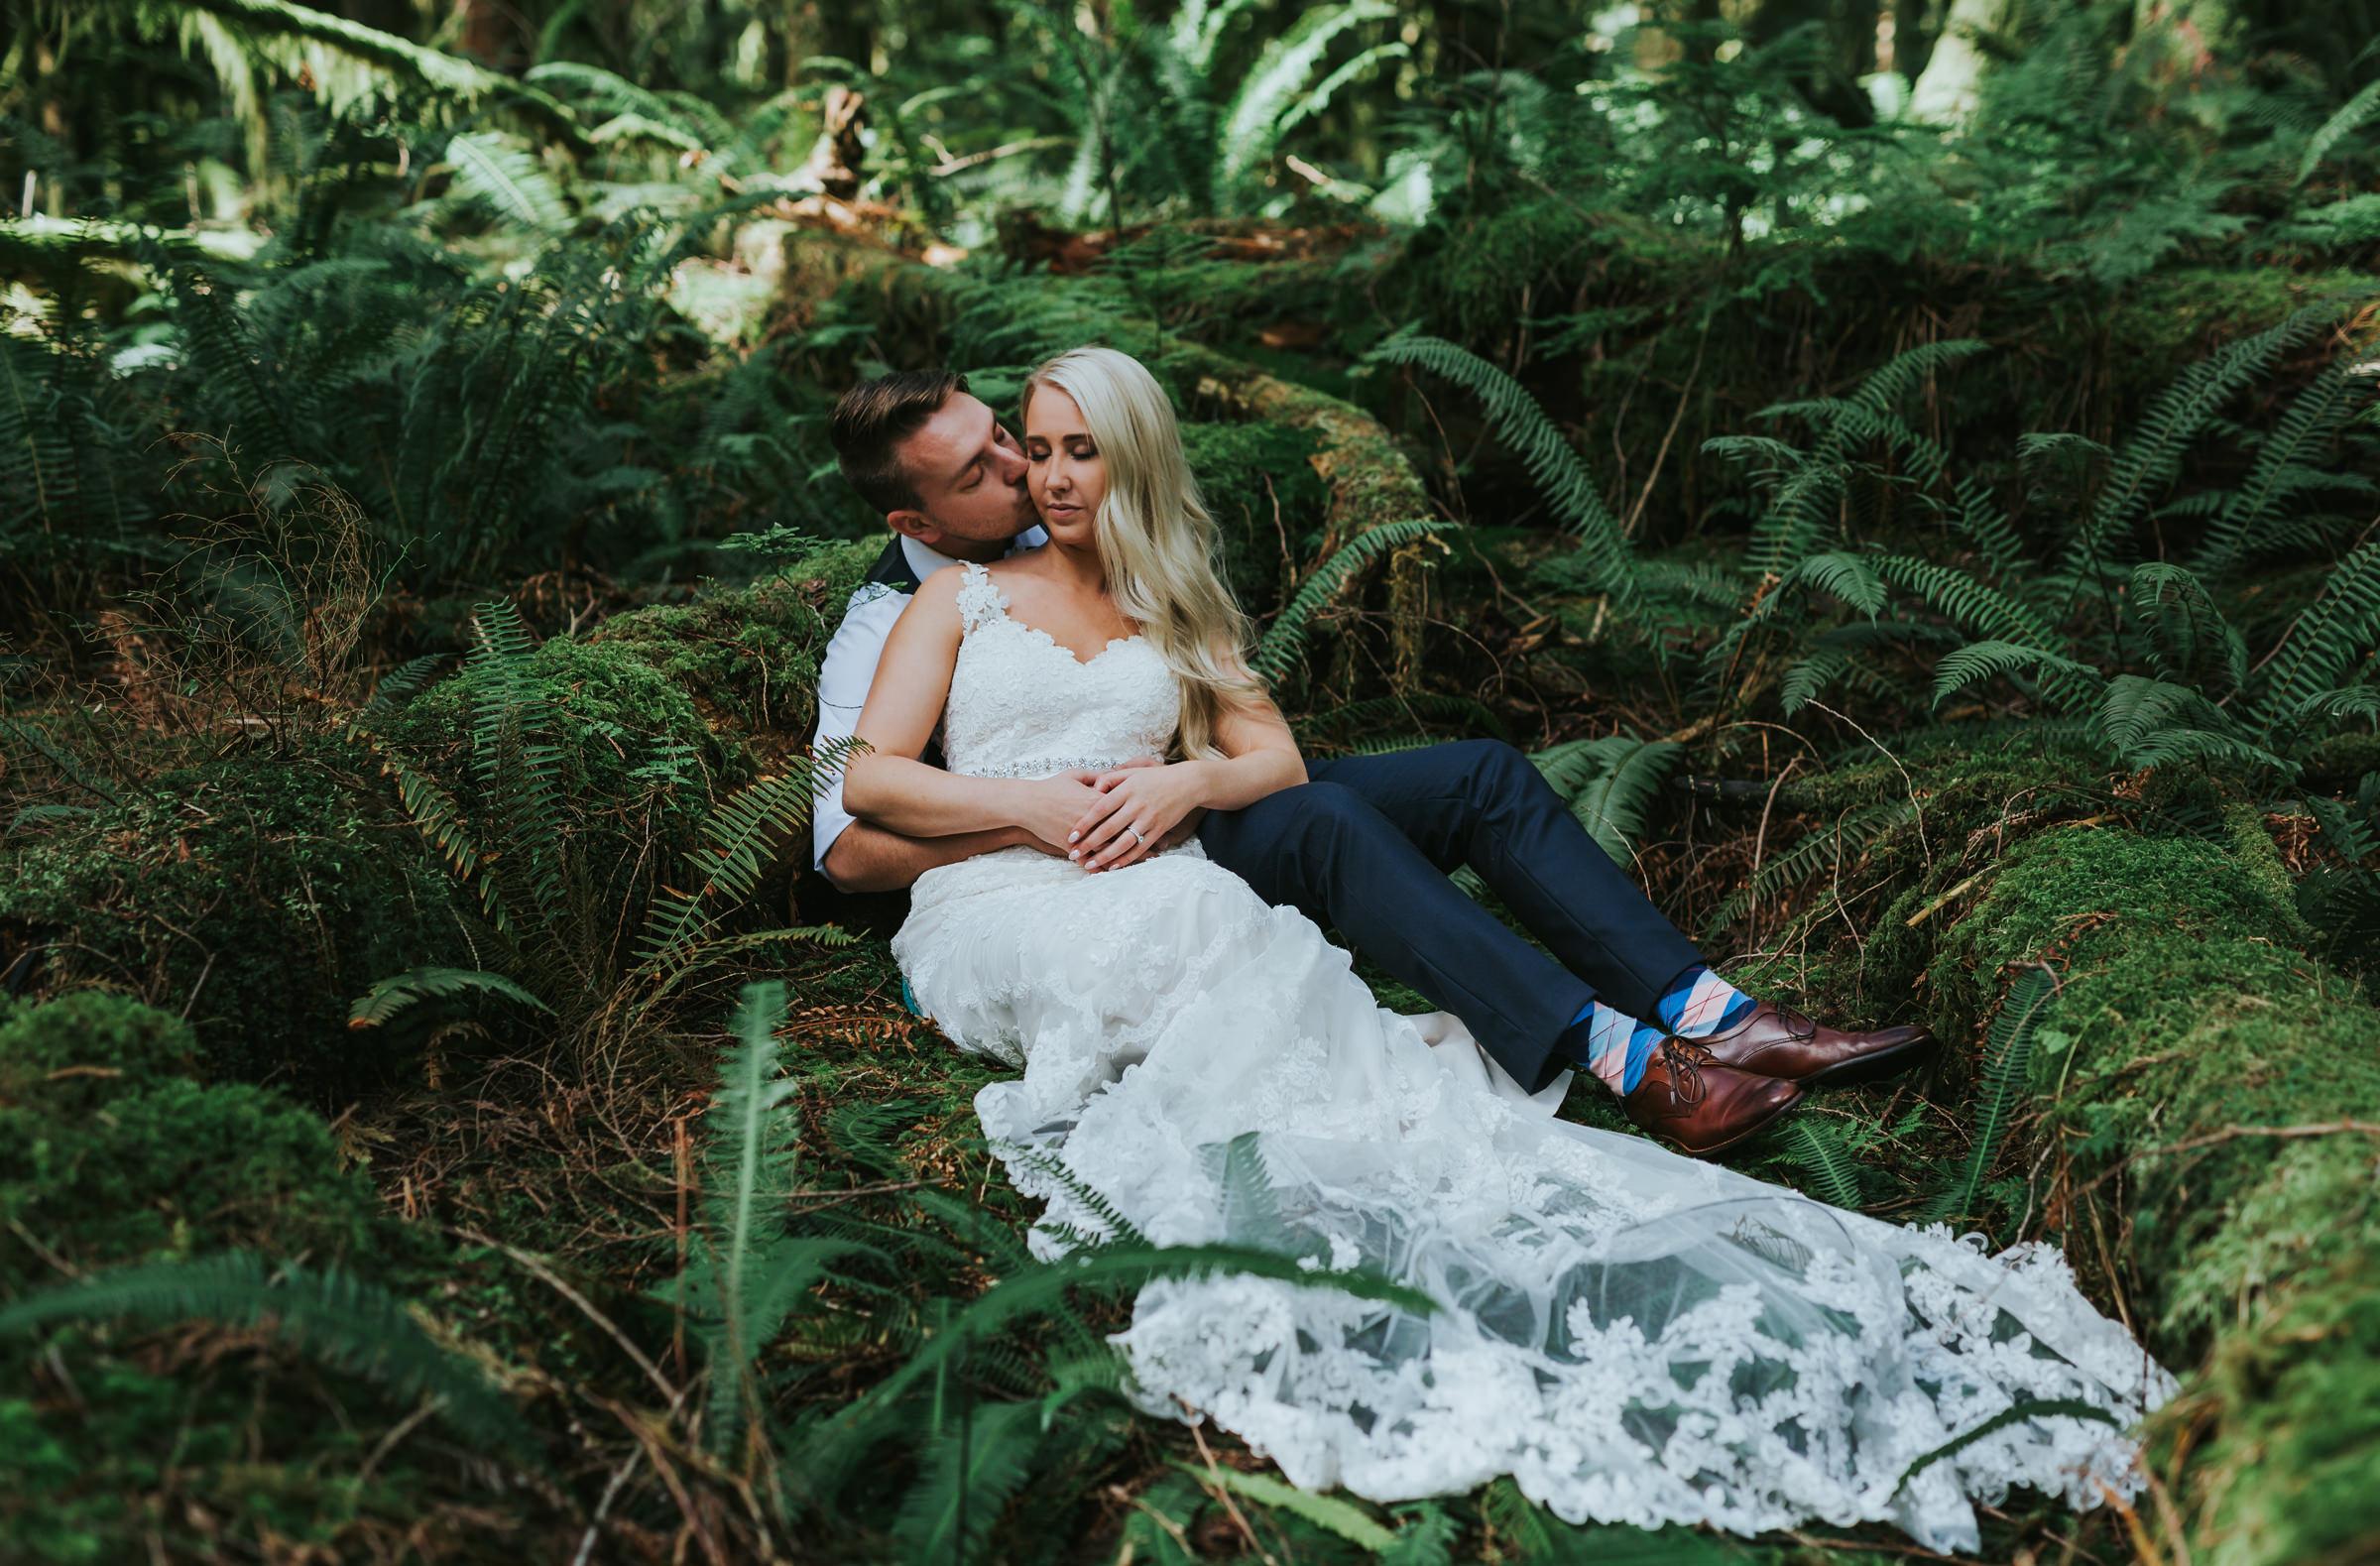 IMG_0823 JENNIFER PICARD PHOTOGRAPHY VANCOUVER WEDDING PHOTOGRAPHER WEB.jpg